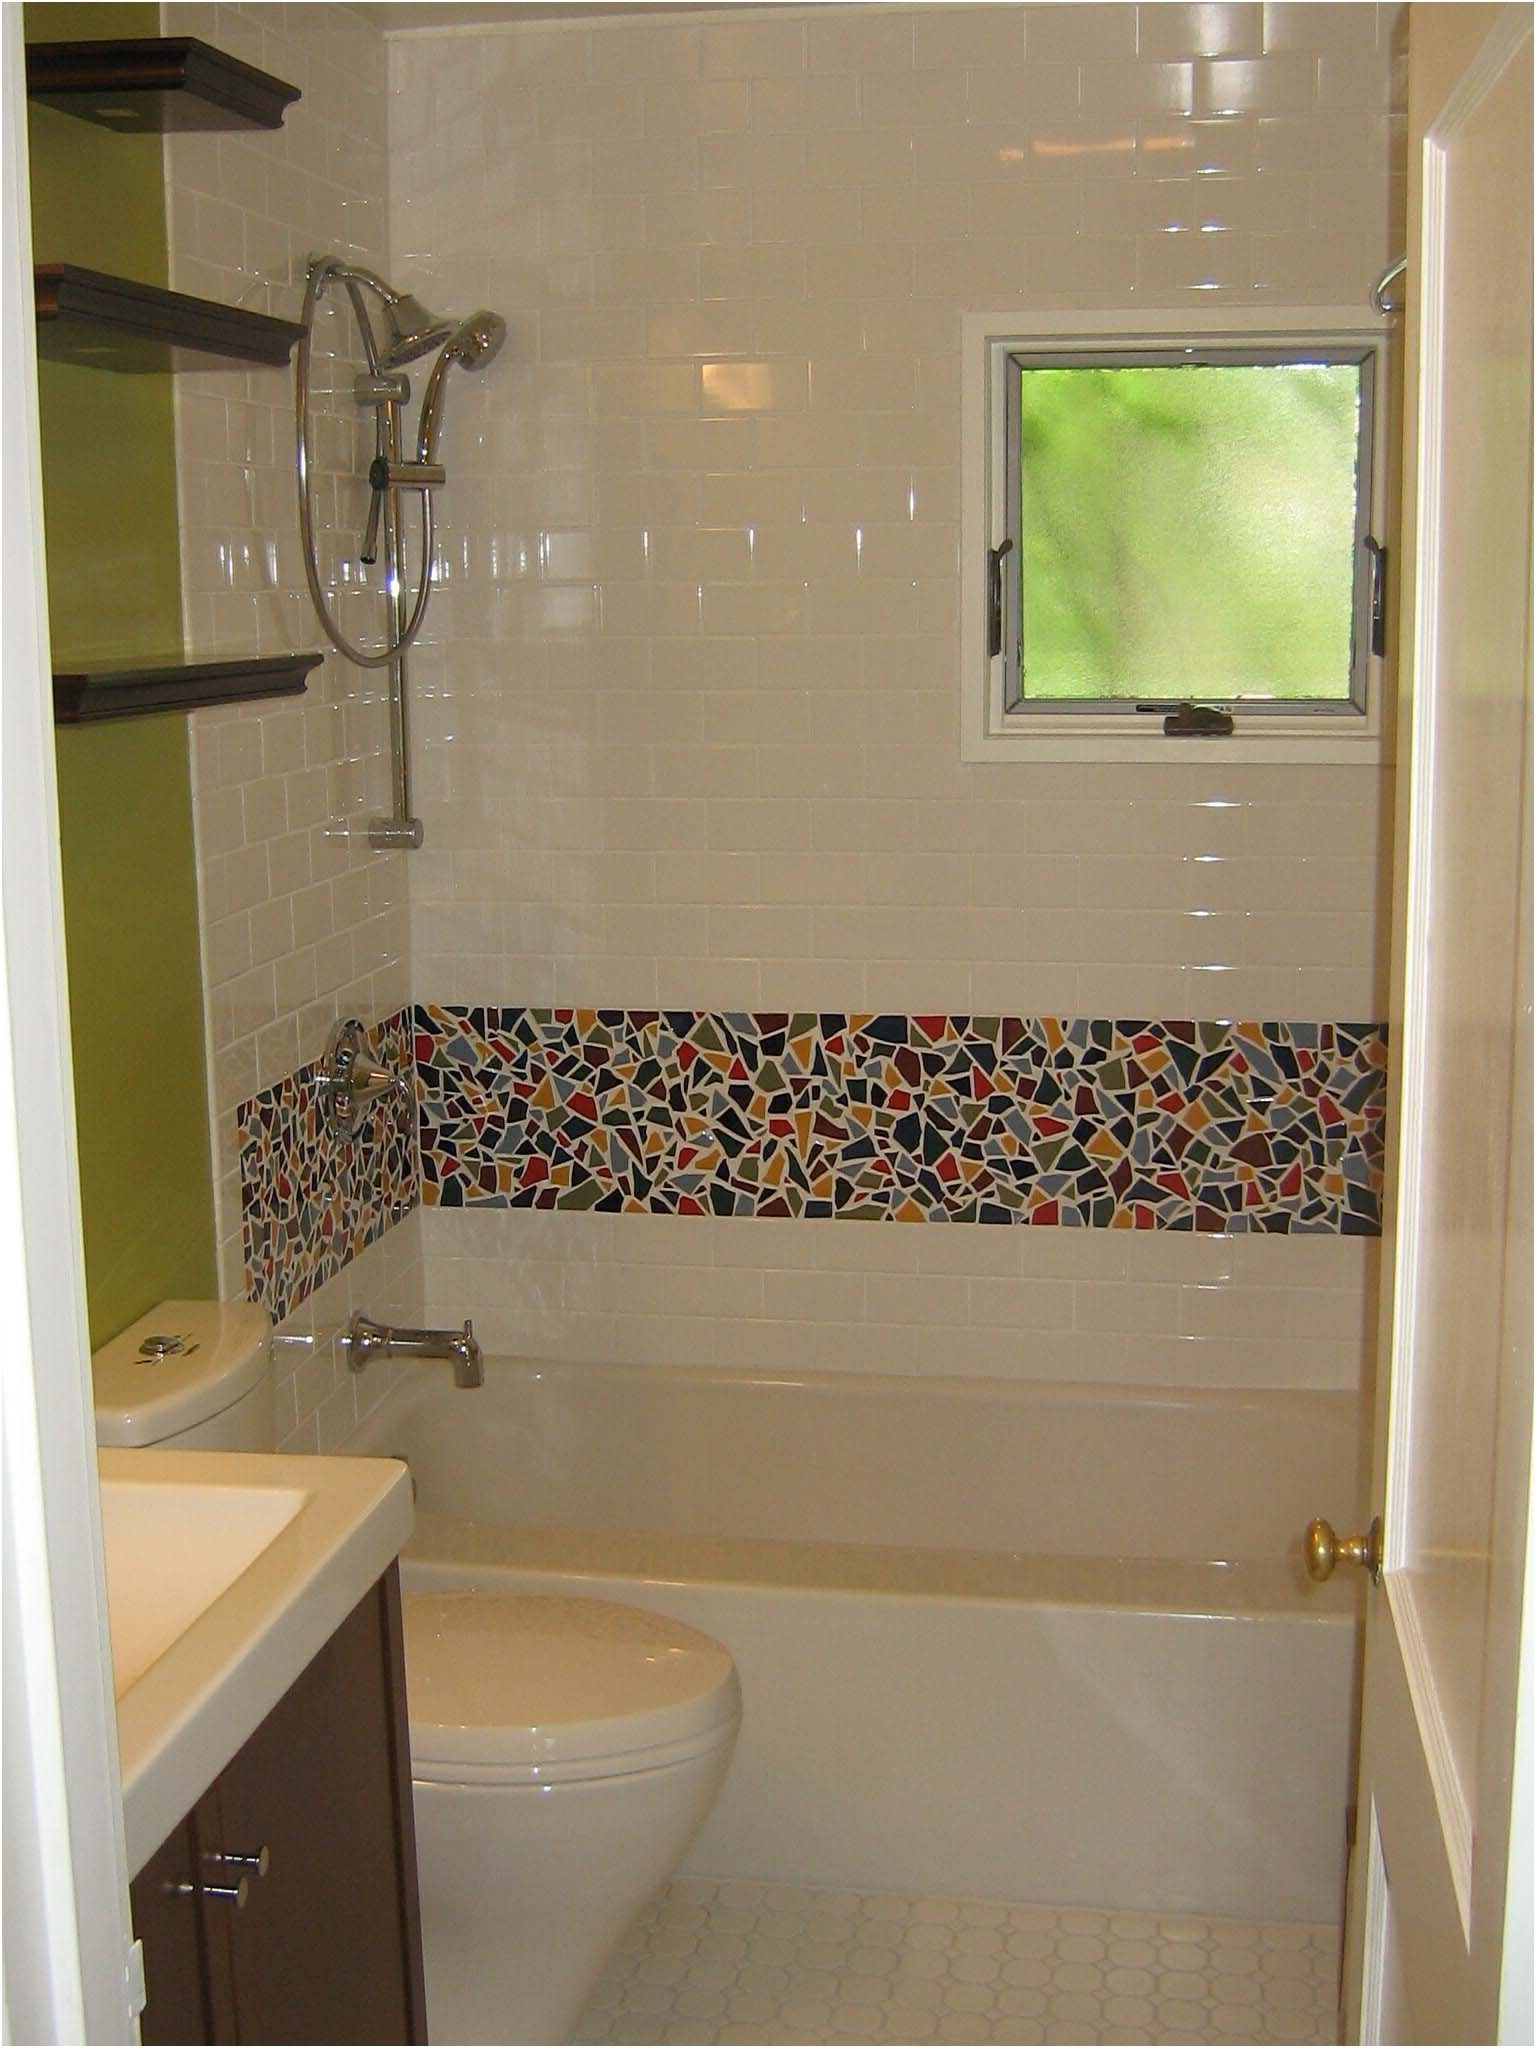 Bathroom Tile Designs With Mosaics Extraordinary Grey Bathroom From Bathroom Mosaic Designs Tips